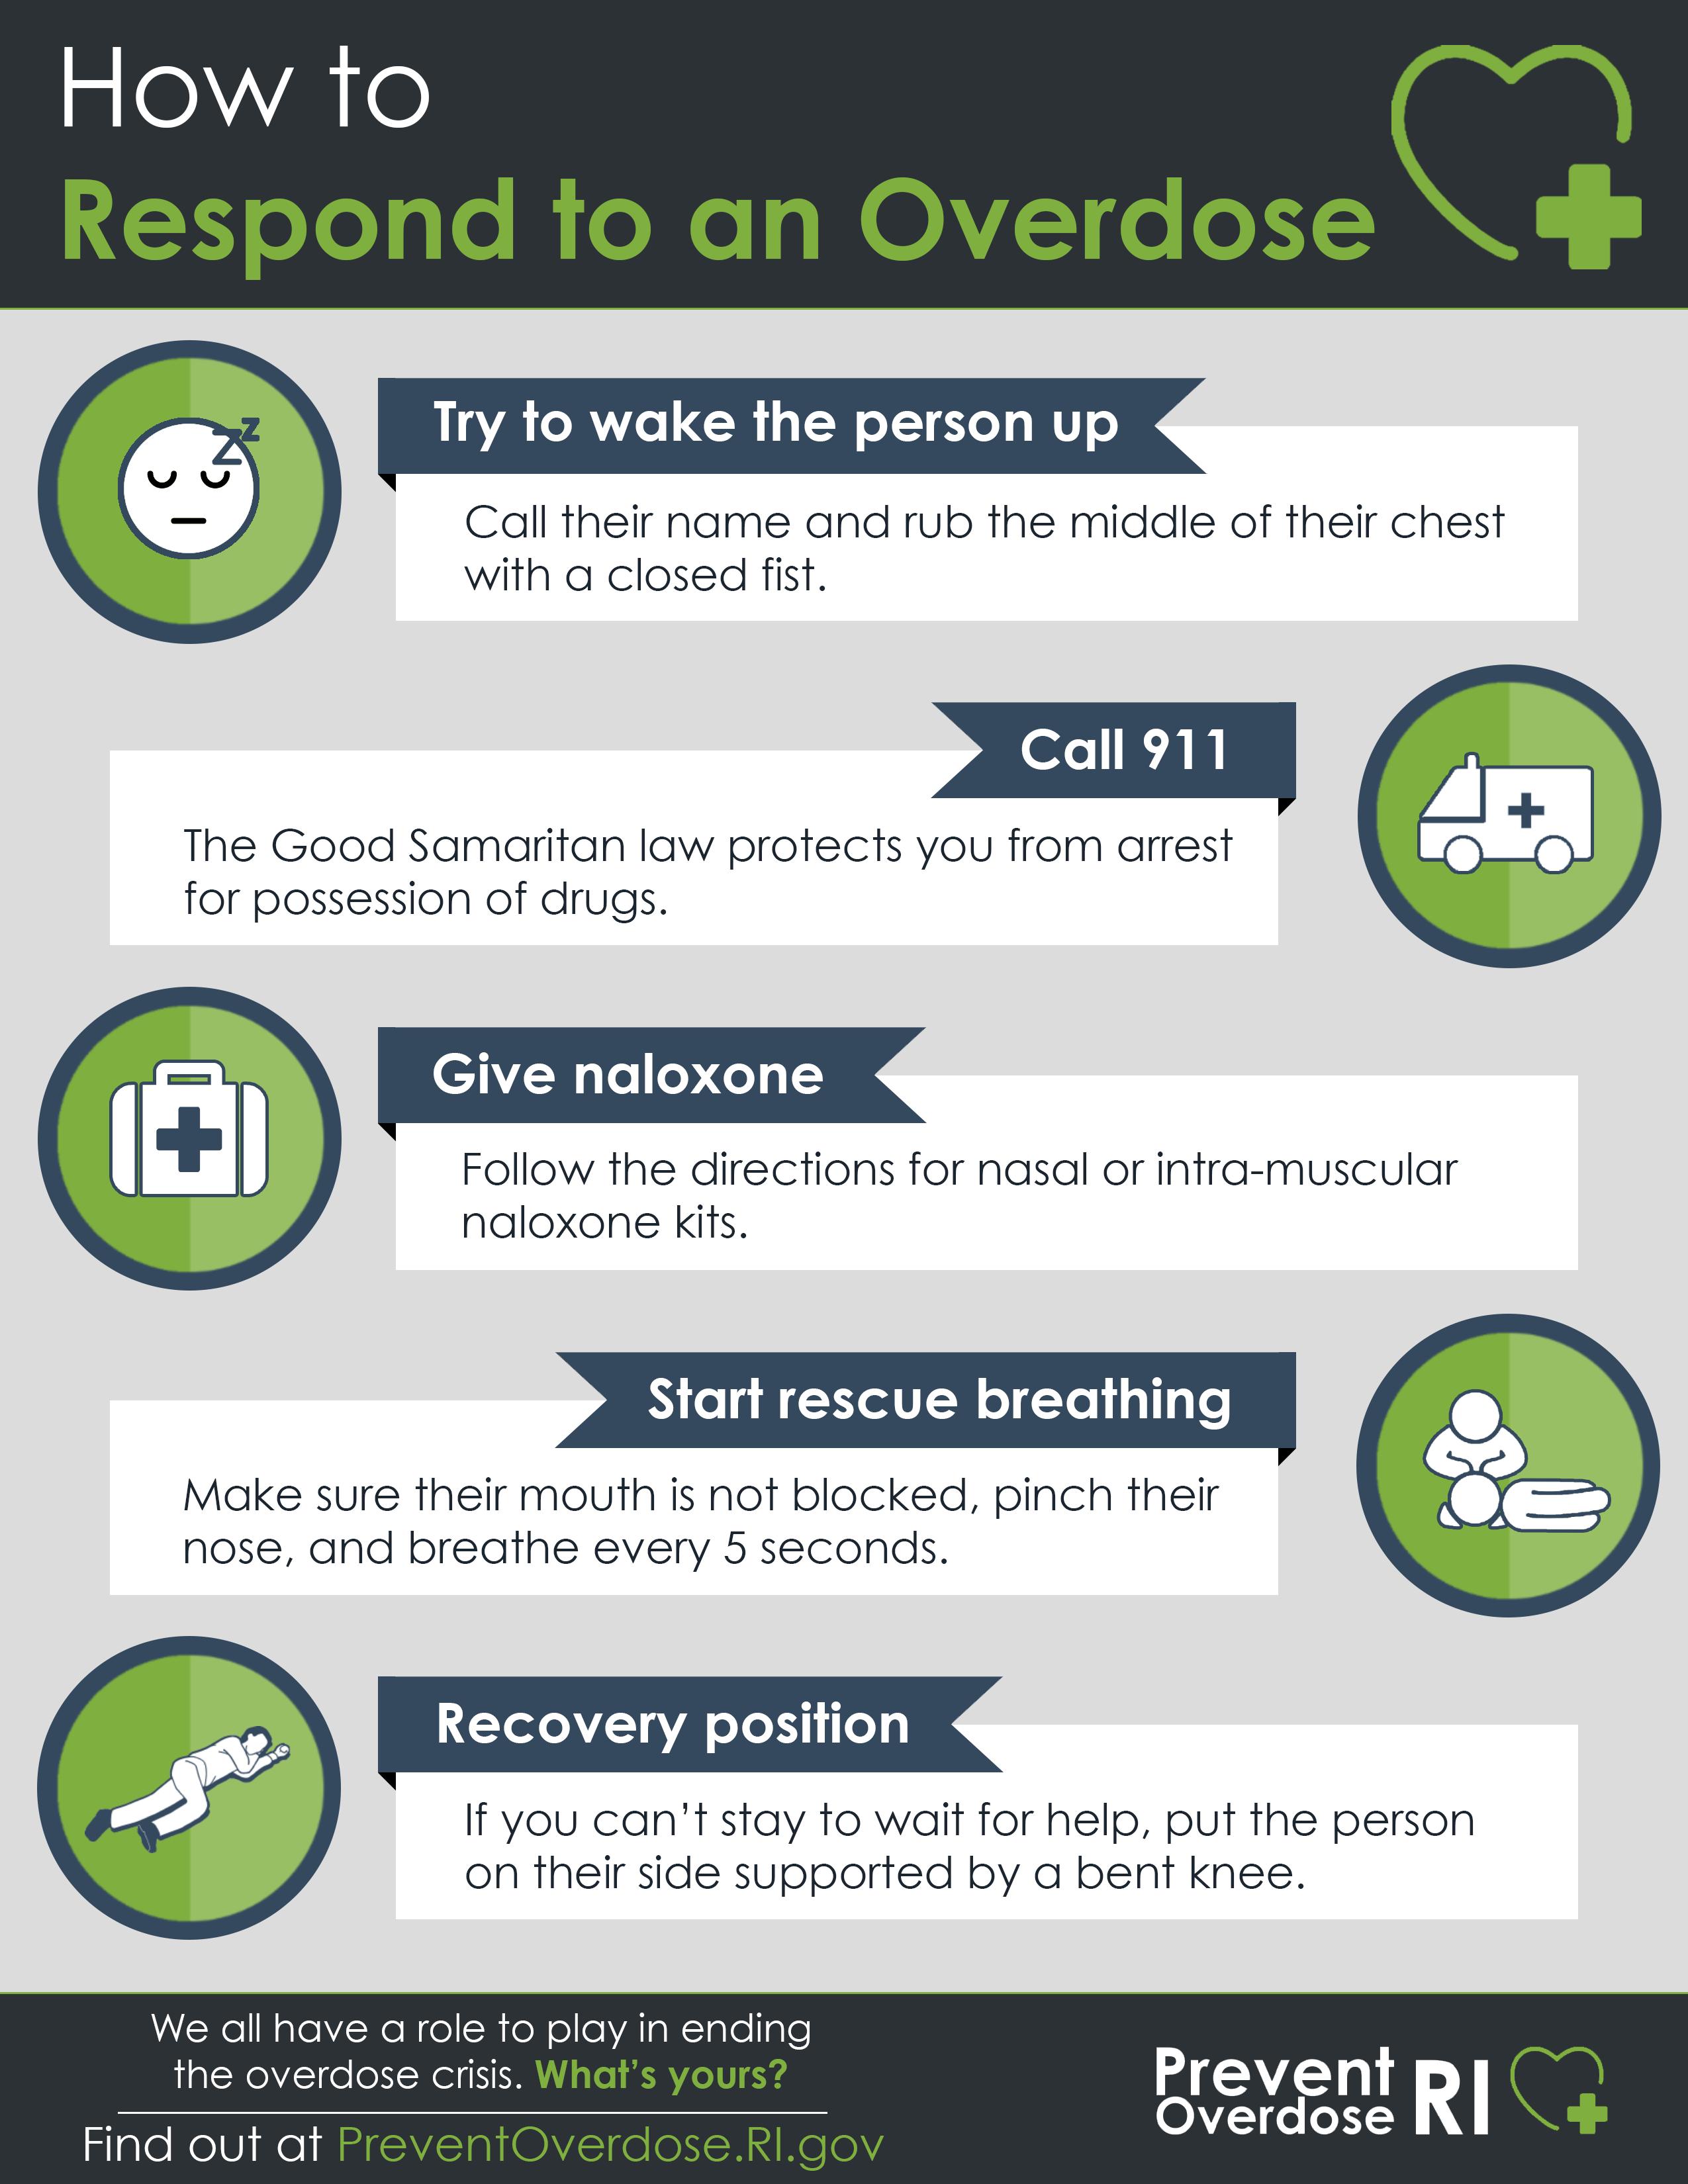 respond-to-overdose-infographic